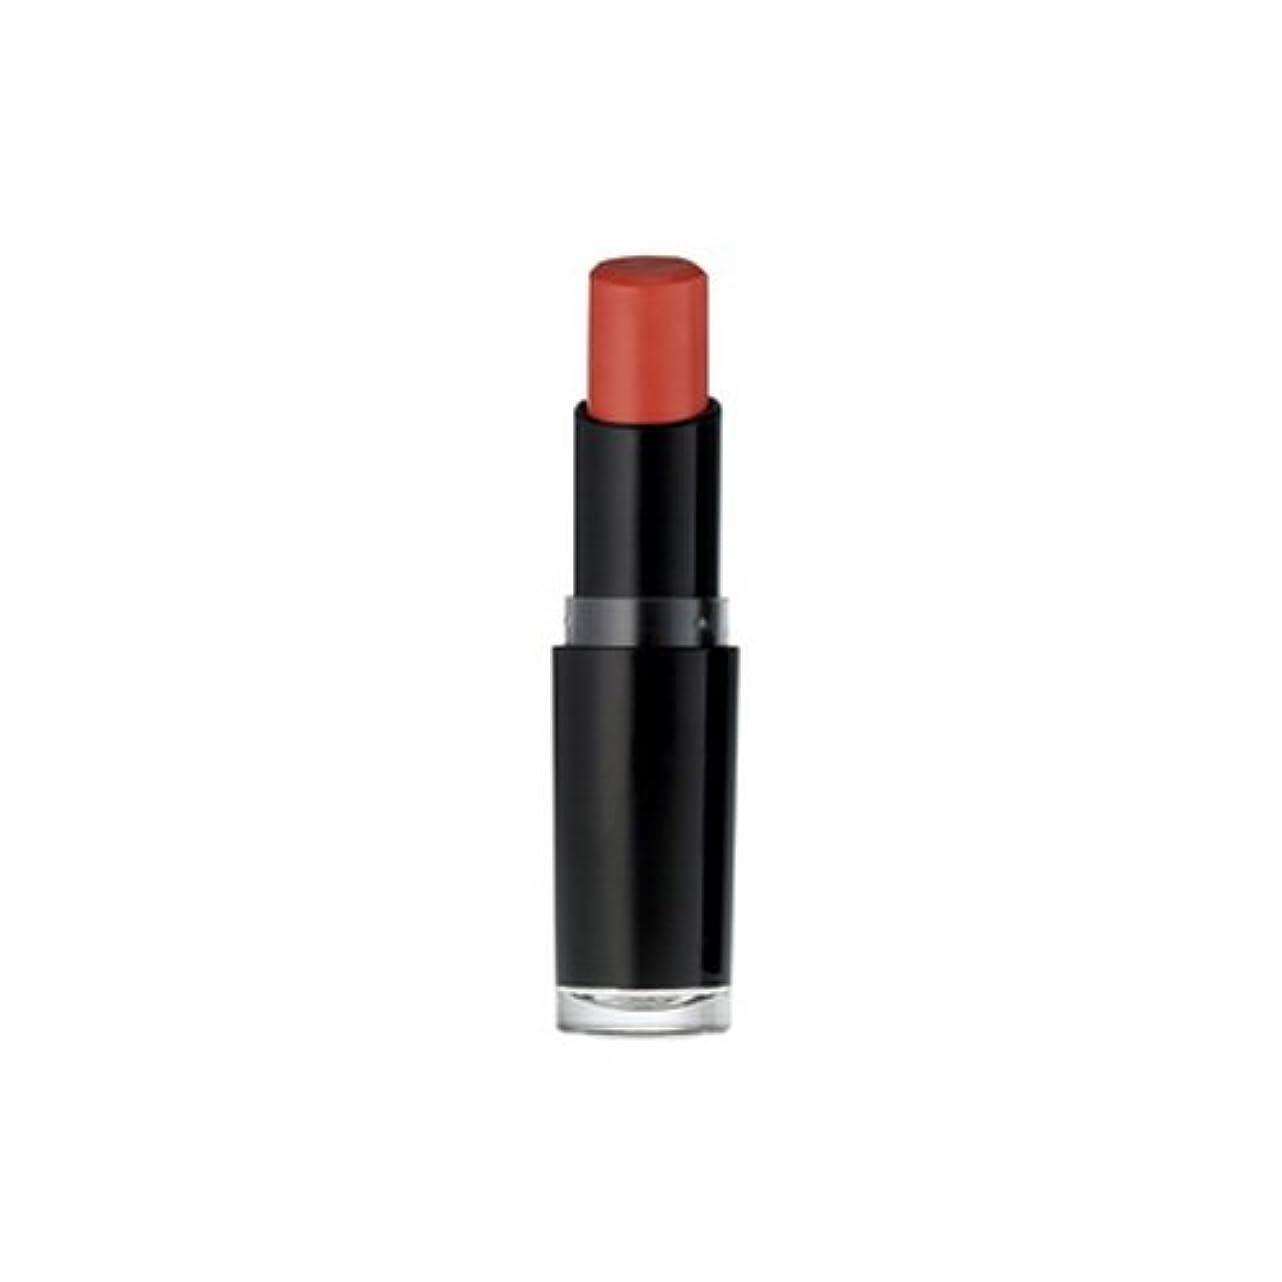 WET N WILD Mega Last Matte Lip Cover - Rose-Bud (並行輸入品)